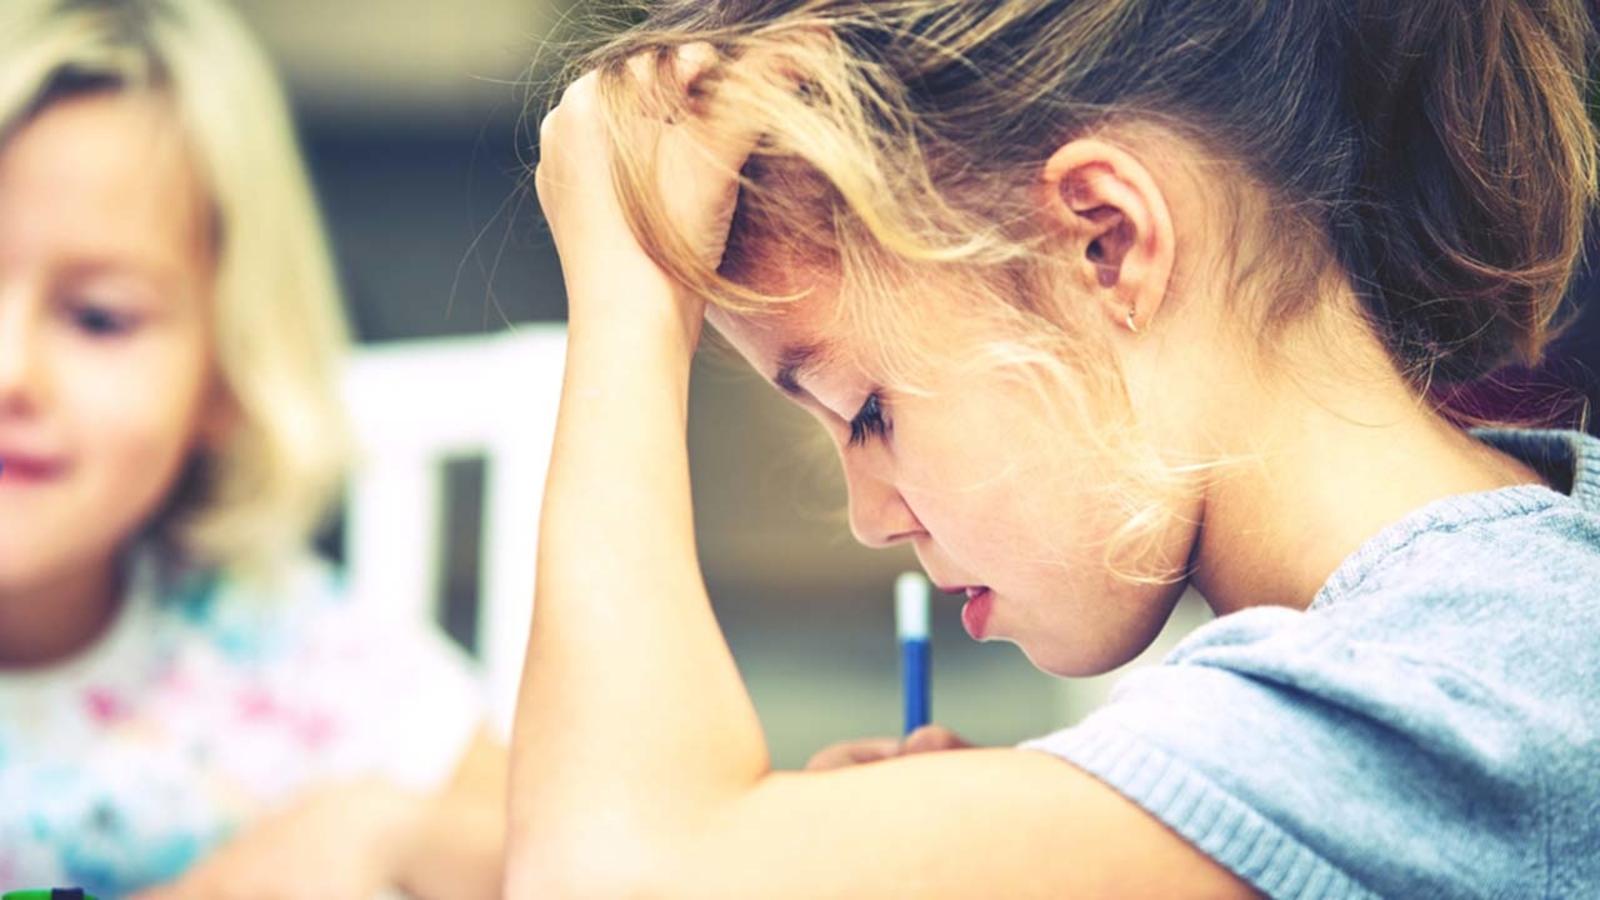 Homework helpline philadelphia